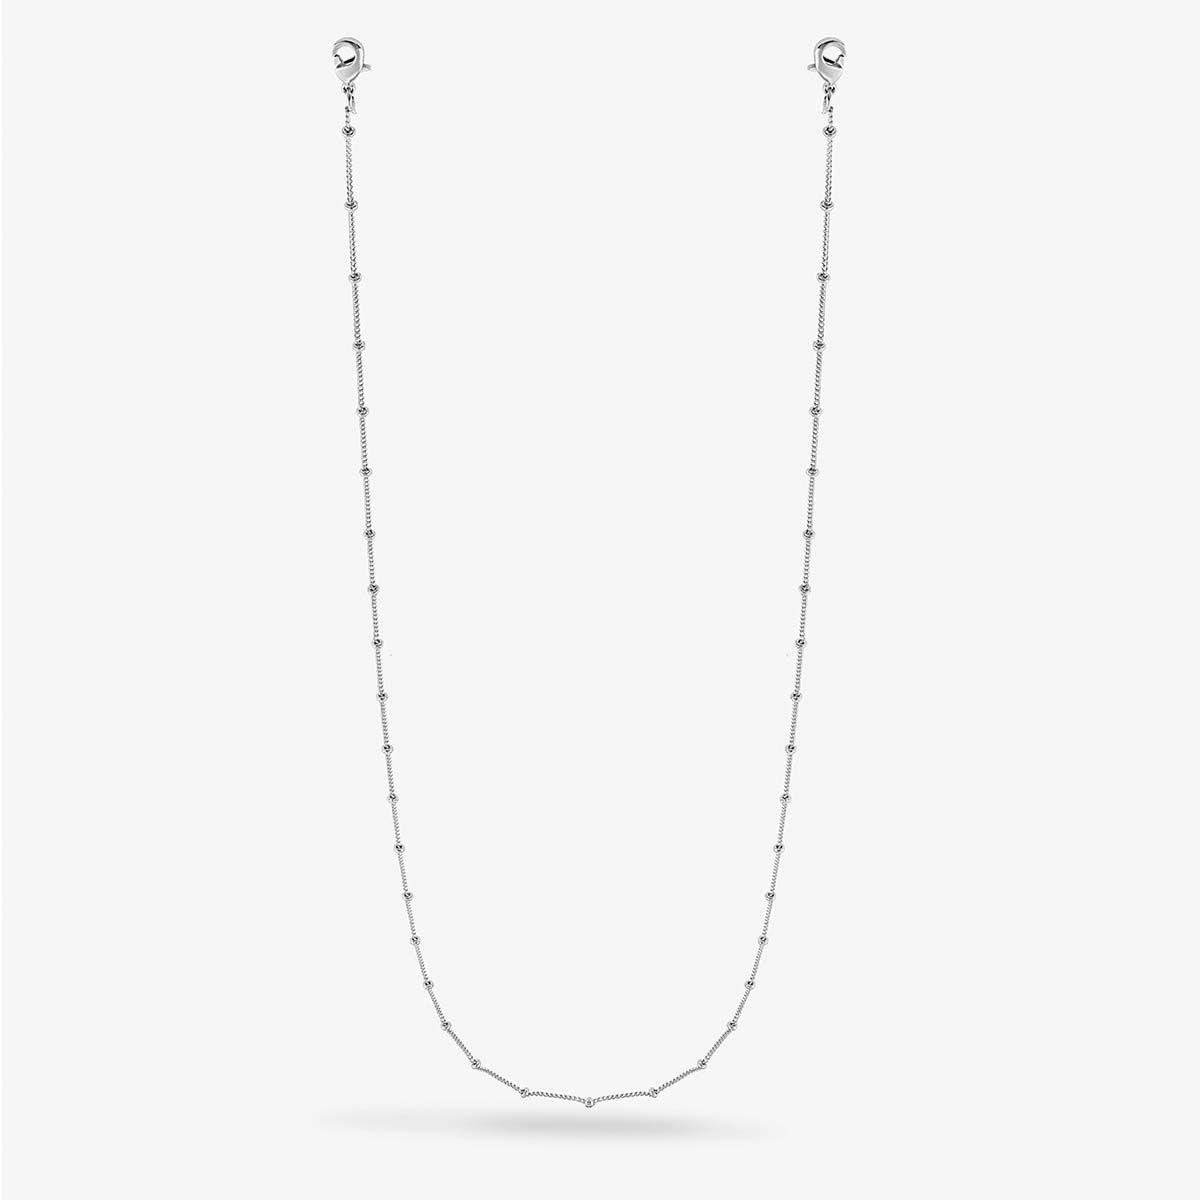 Lotta - Halsketten - Silber